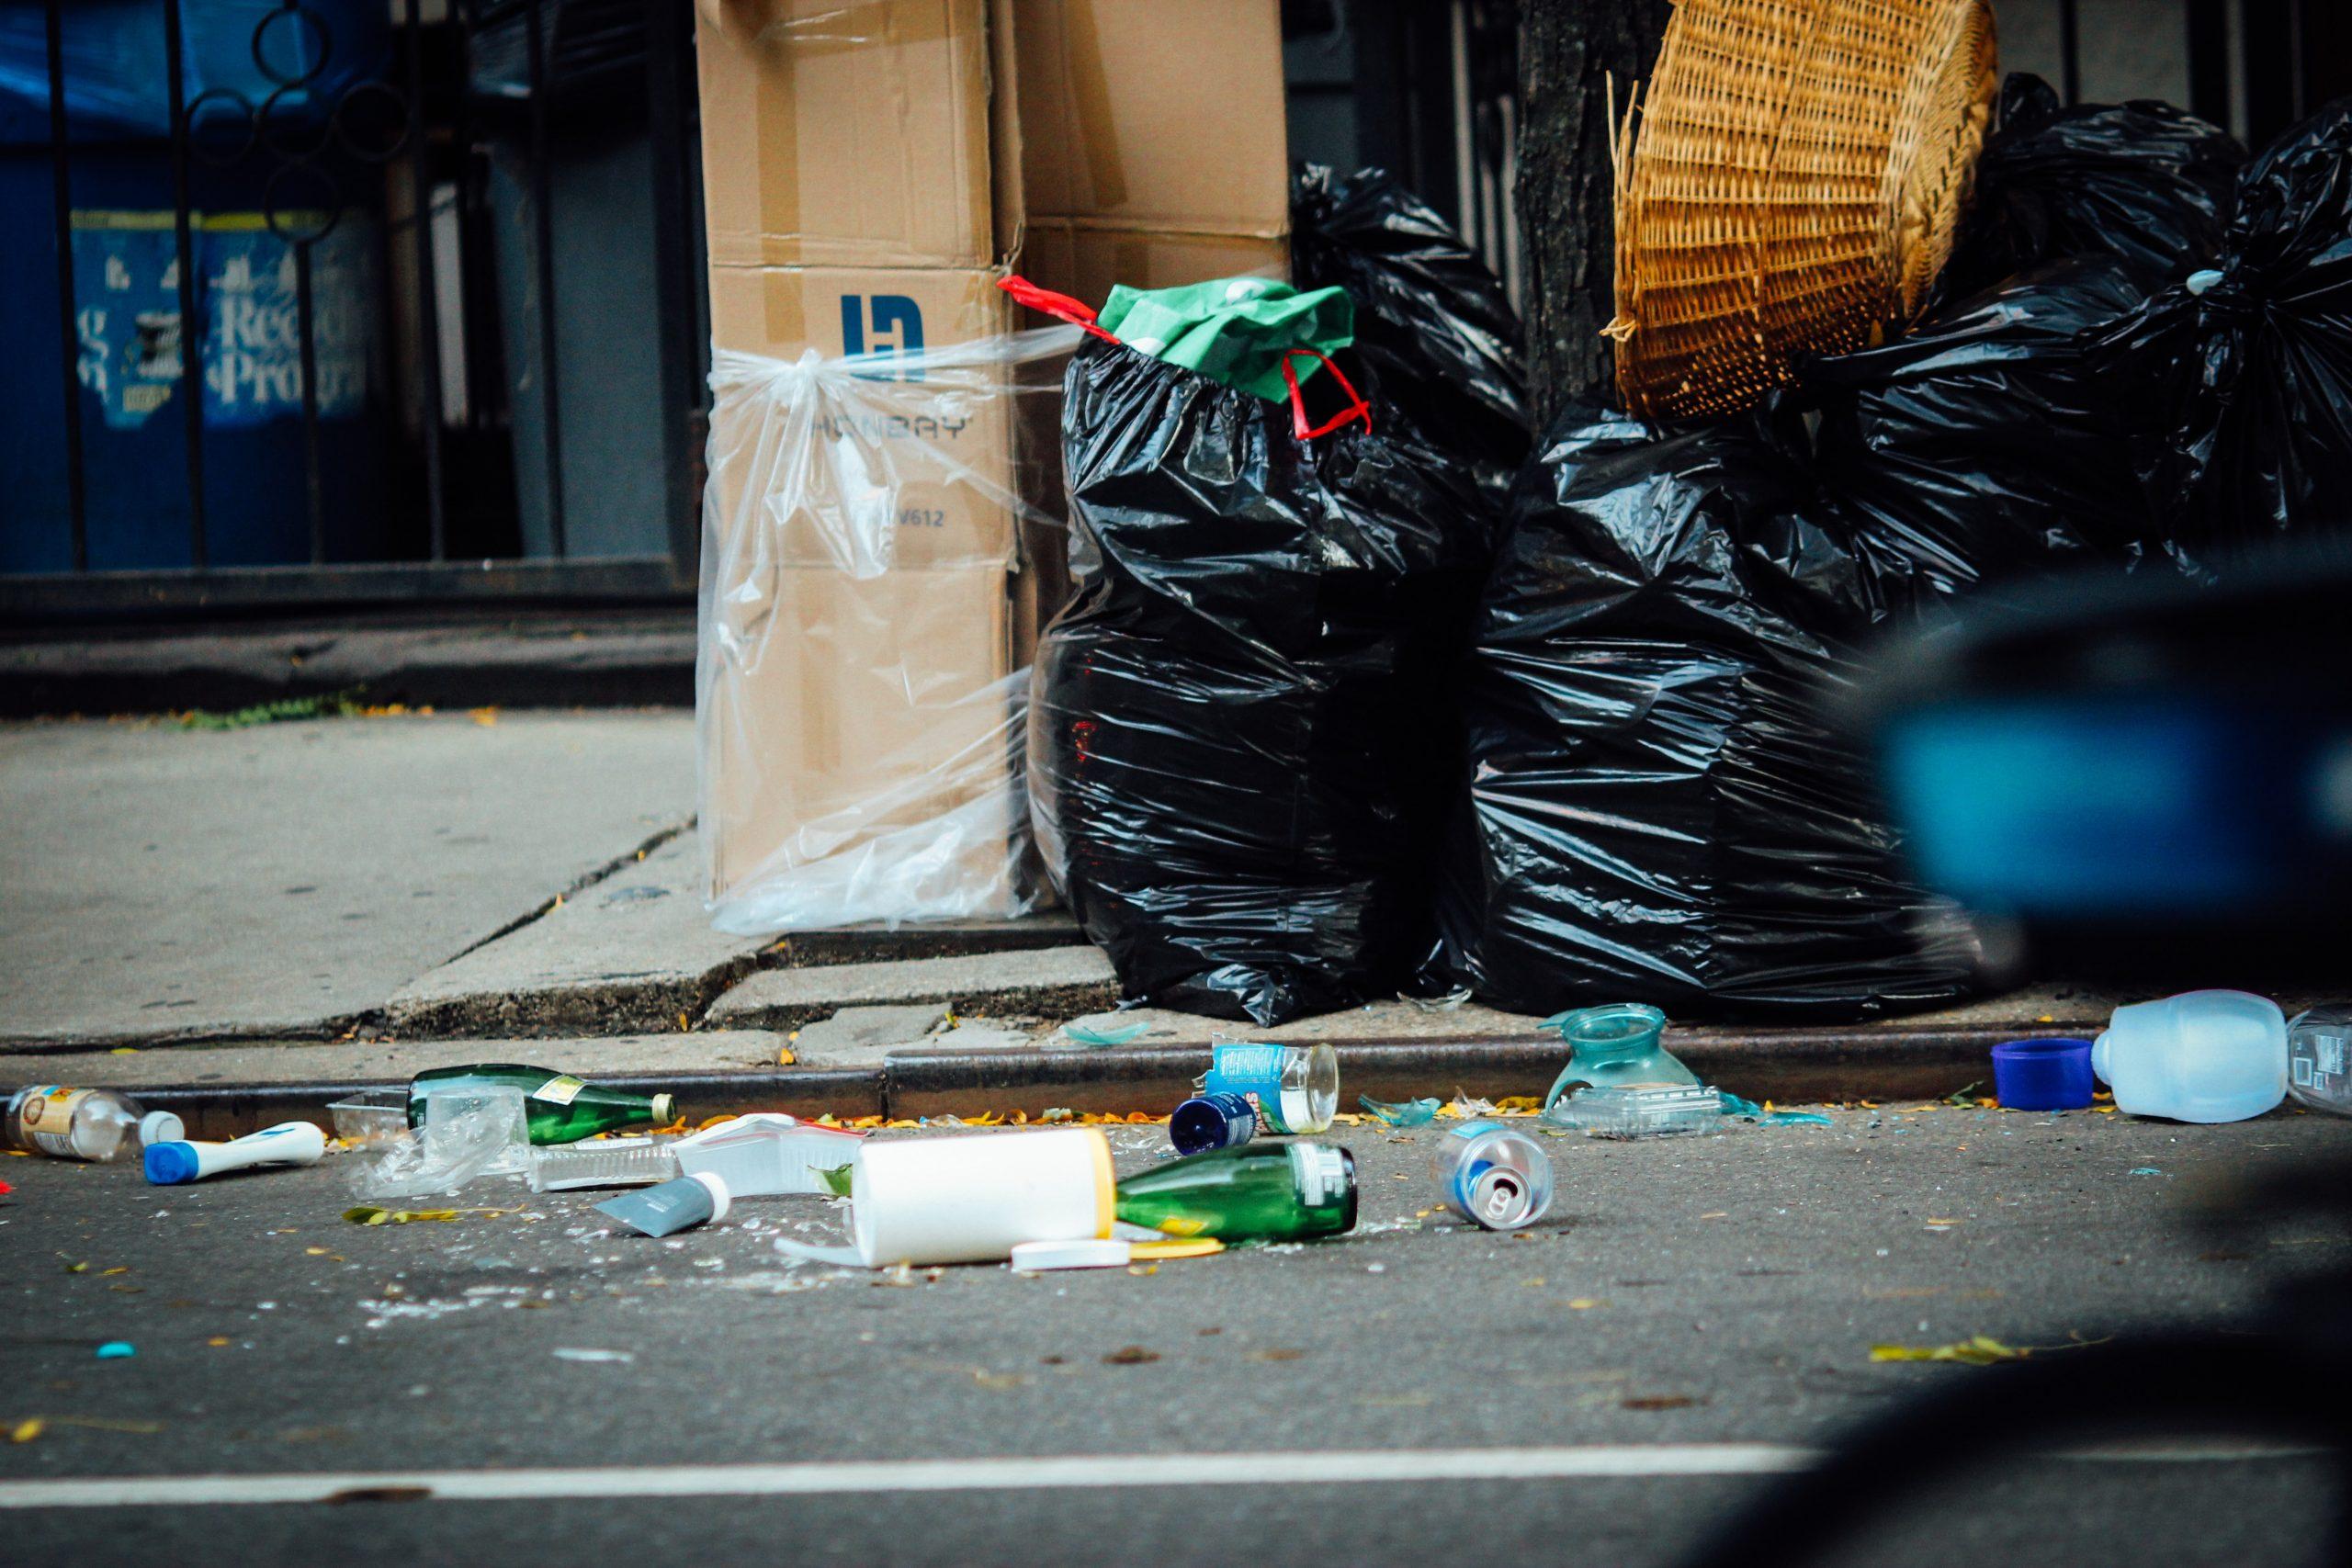 UK litter problem